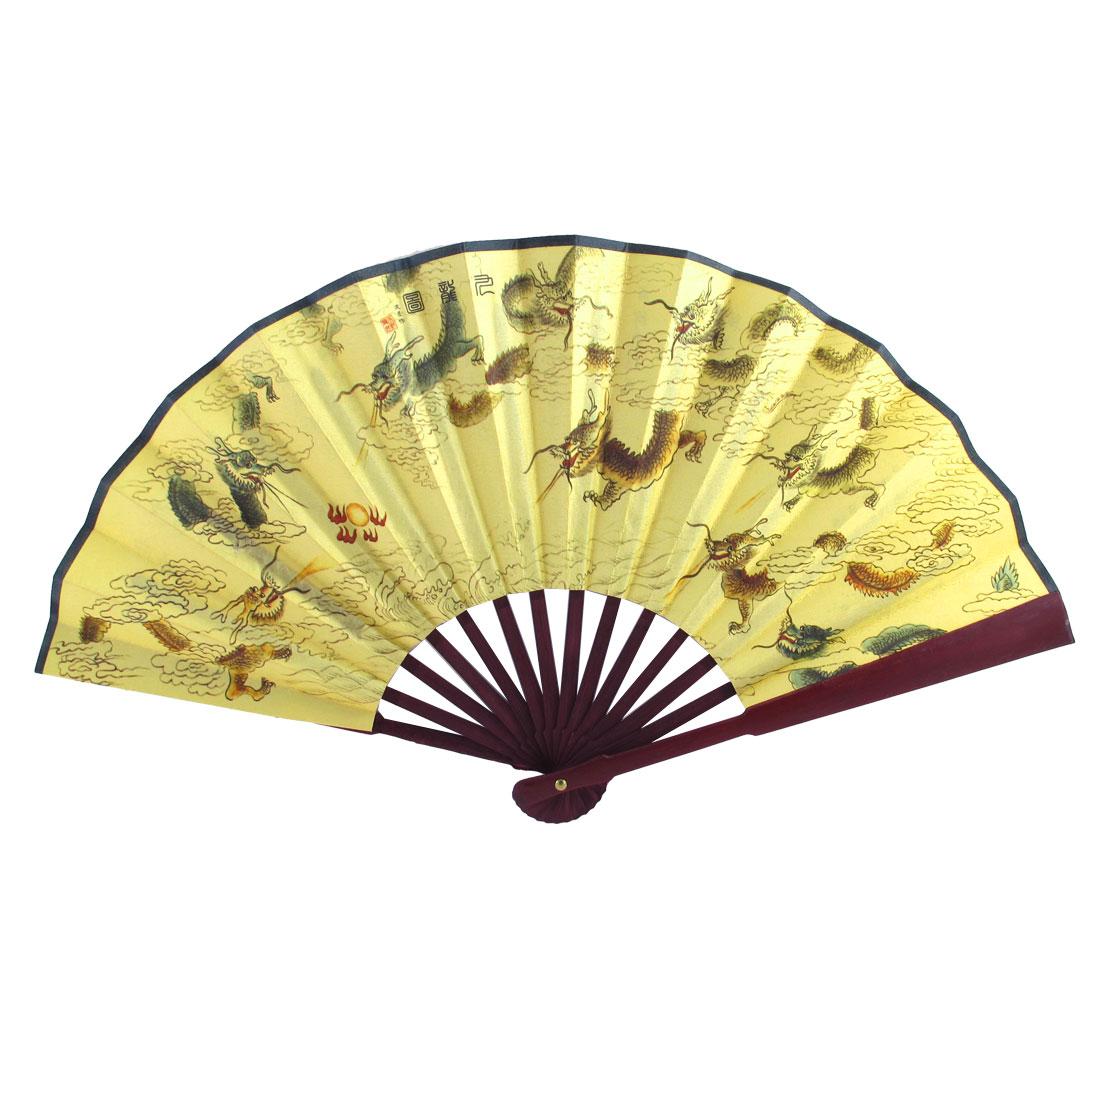 Bamboo Handle Dragon Chinese Poem Print Folding Hand Fan 47cm Width Yellow